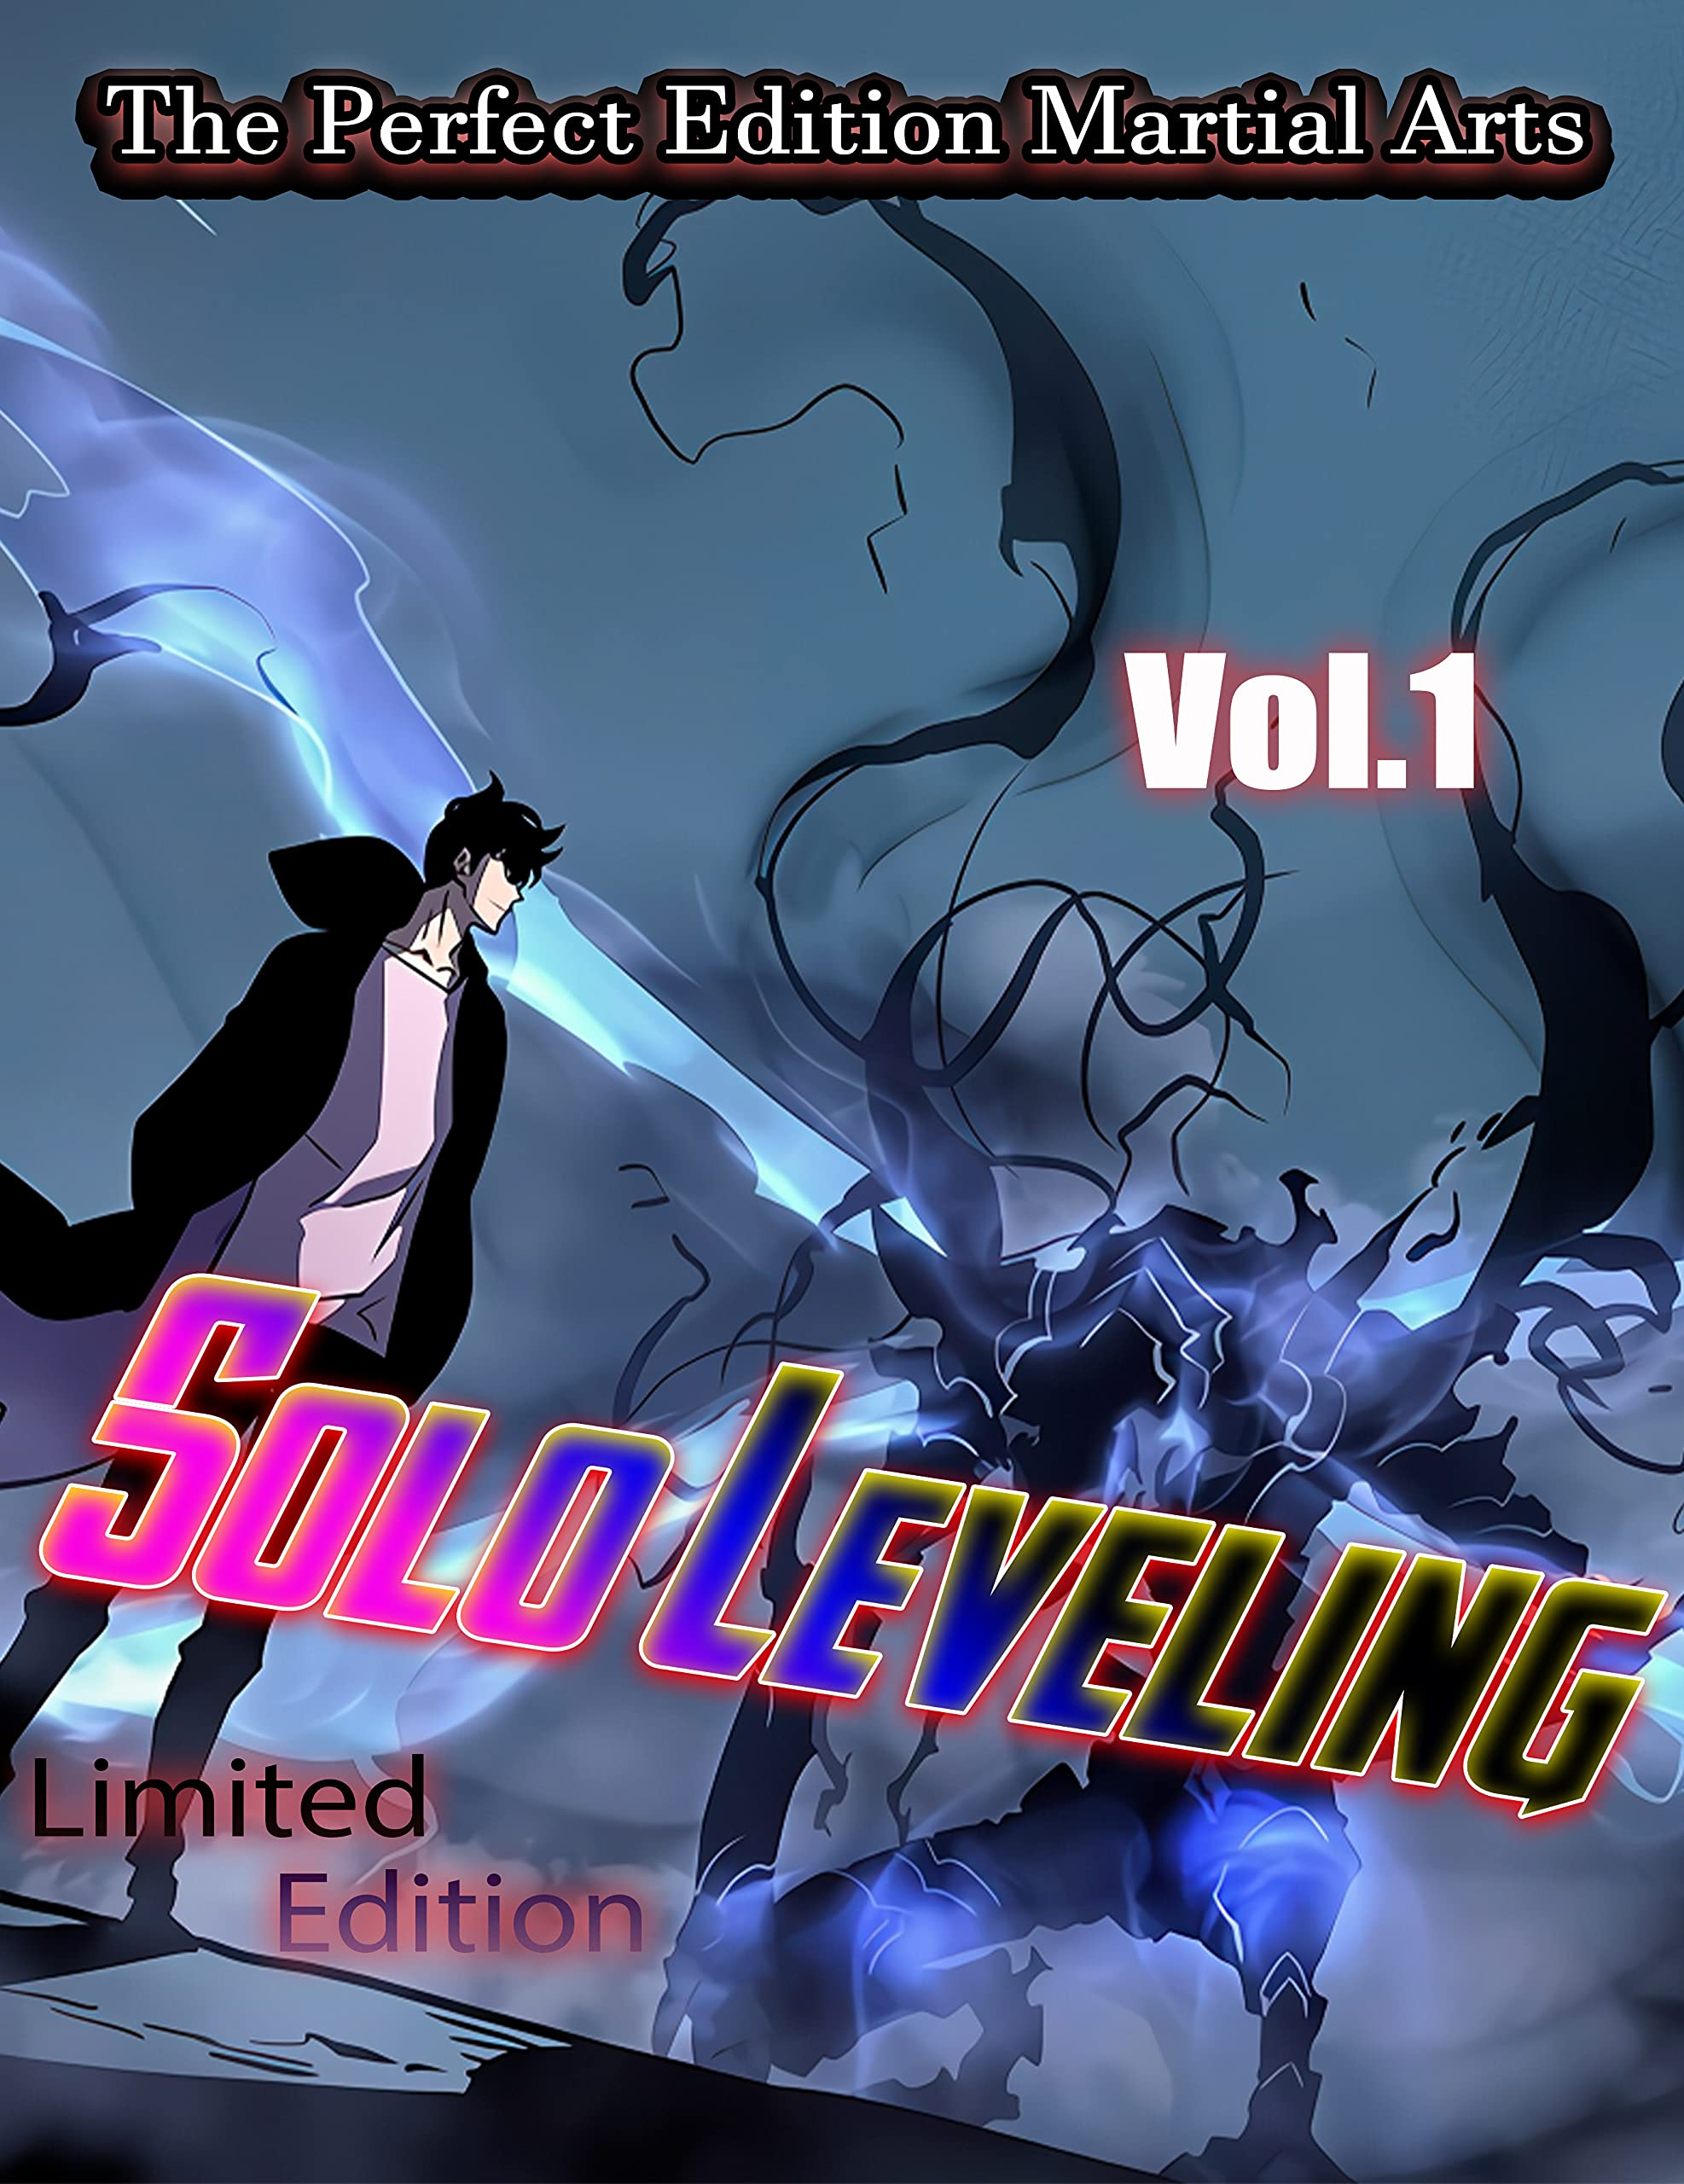 The Perfect Edition Martial arts Manga Solo Leveling Graphic: Limited Edition Solo Leveling Vol 1